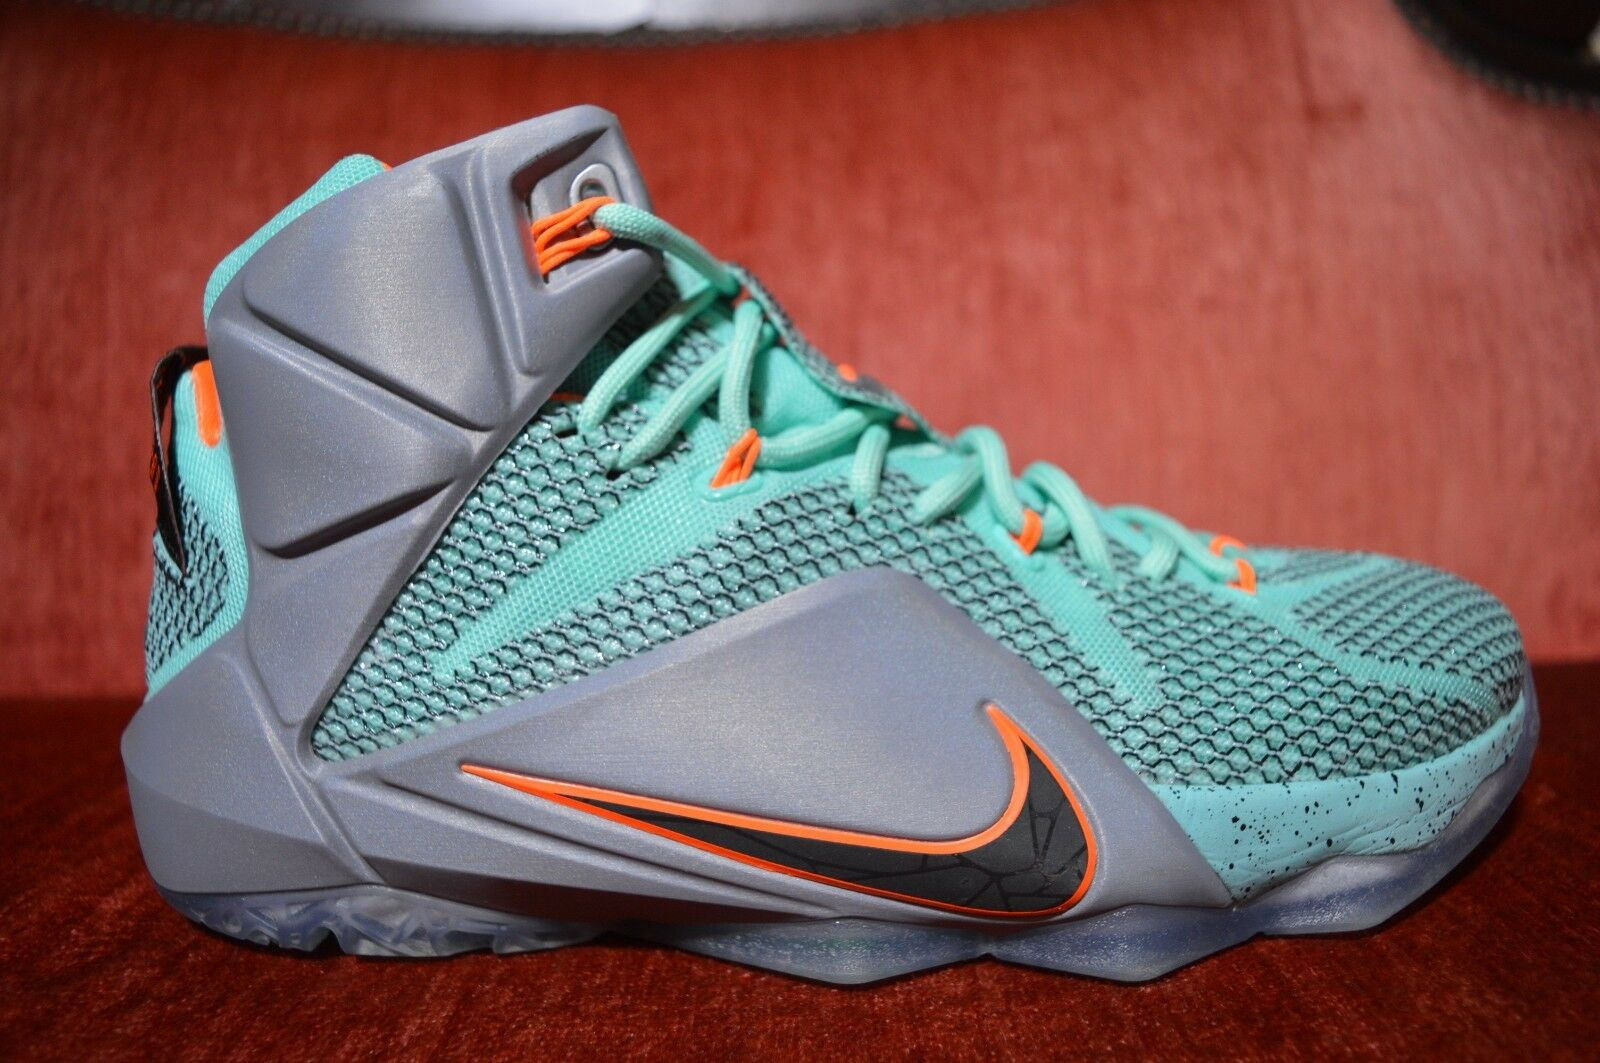 Nike Lebron XII 12 NSRL Miami Dolphins Black Grey Turquoise Size 8.5 684593-301